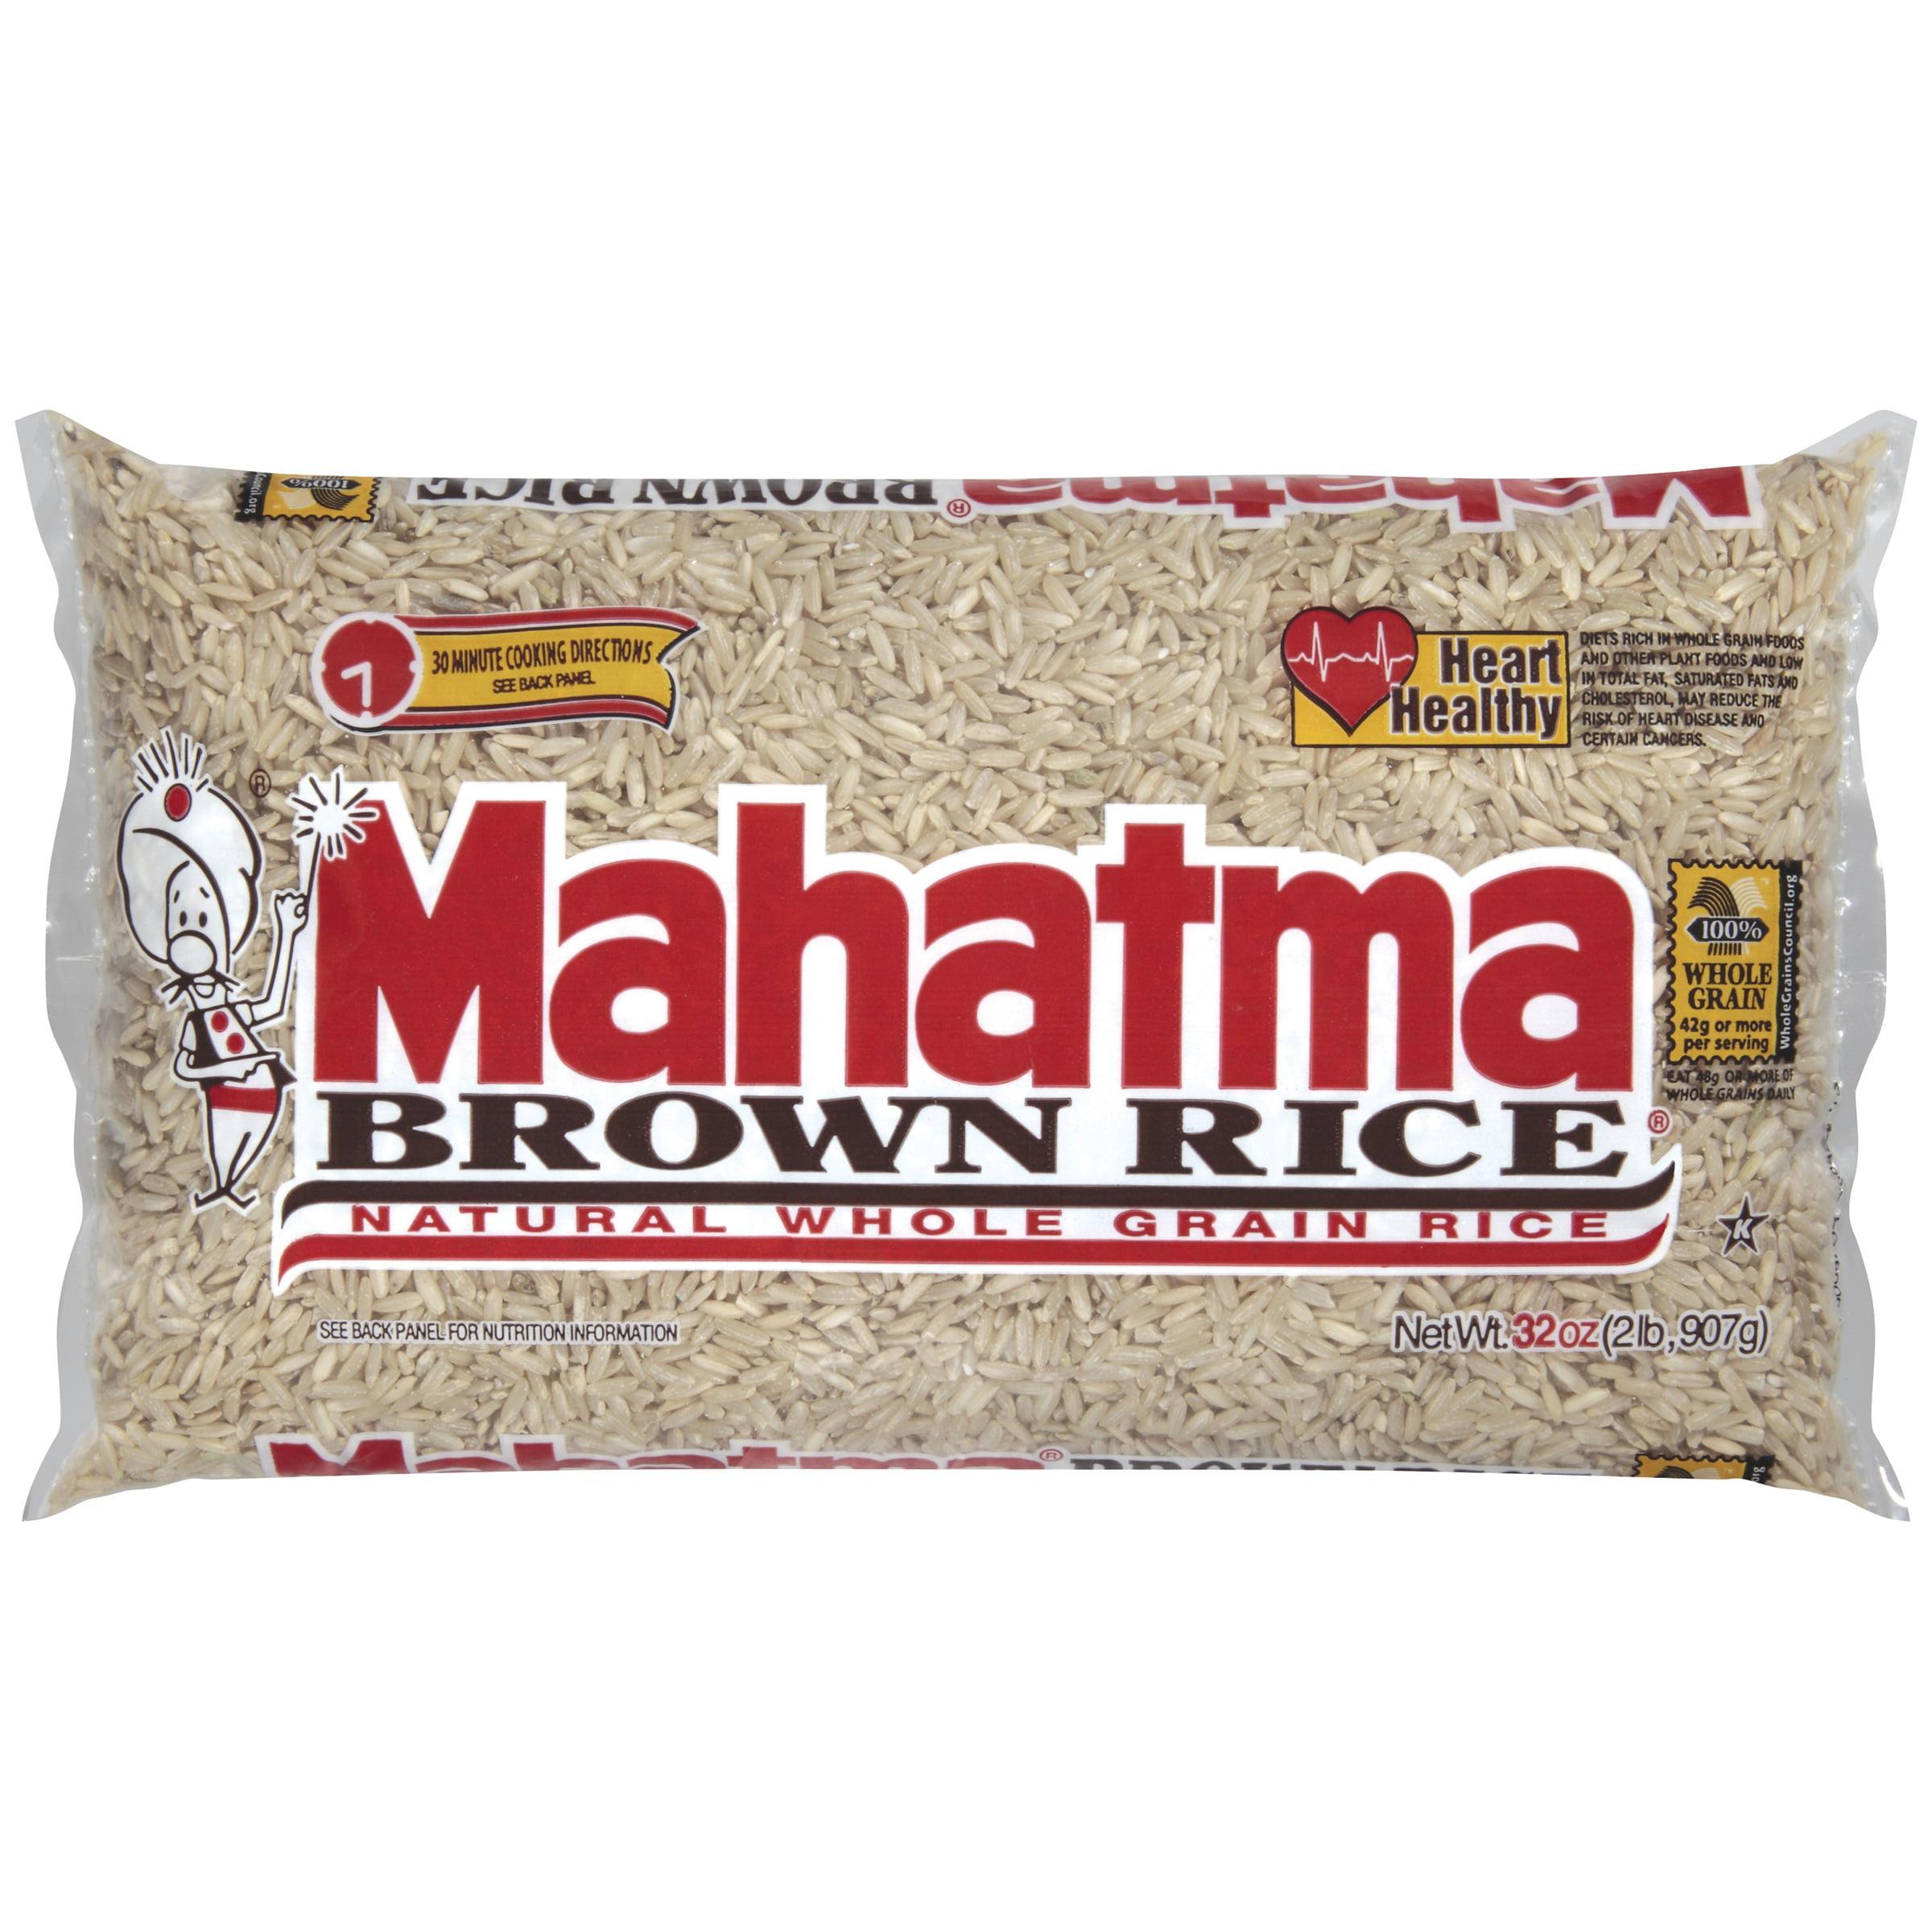 Mahatma Brown Rice, 320 Oz